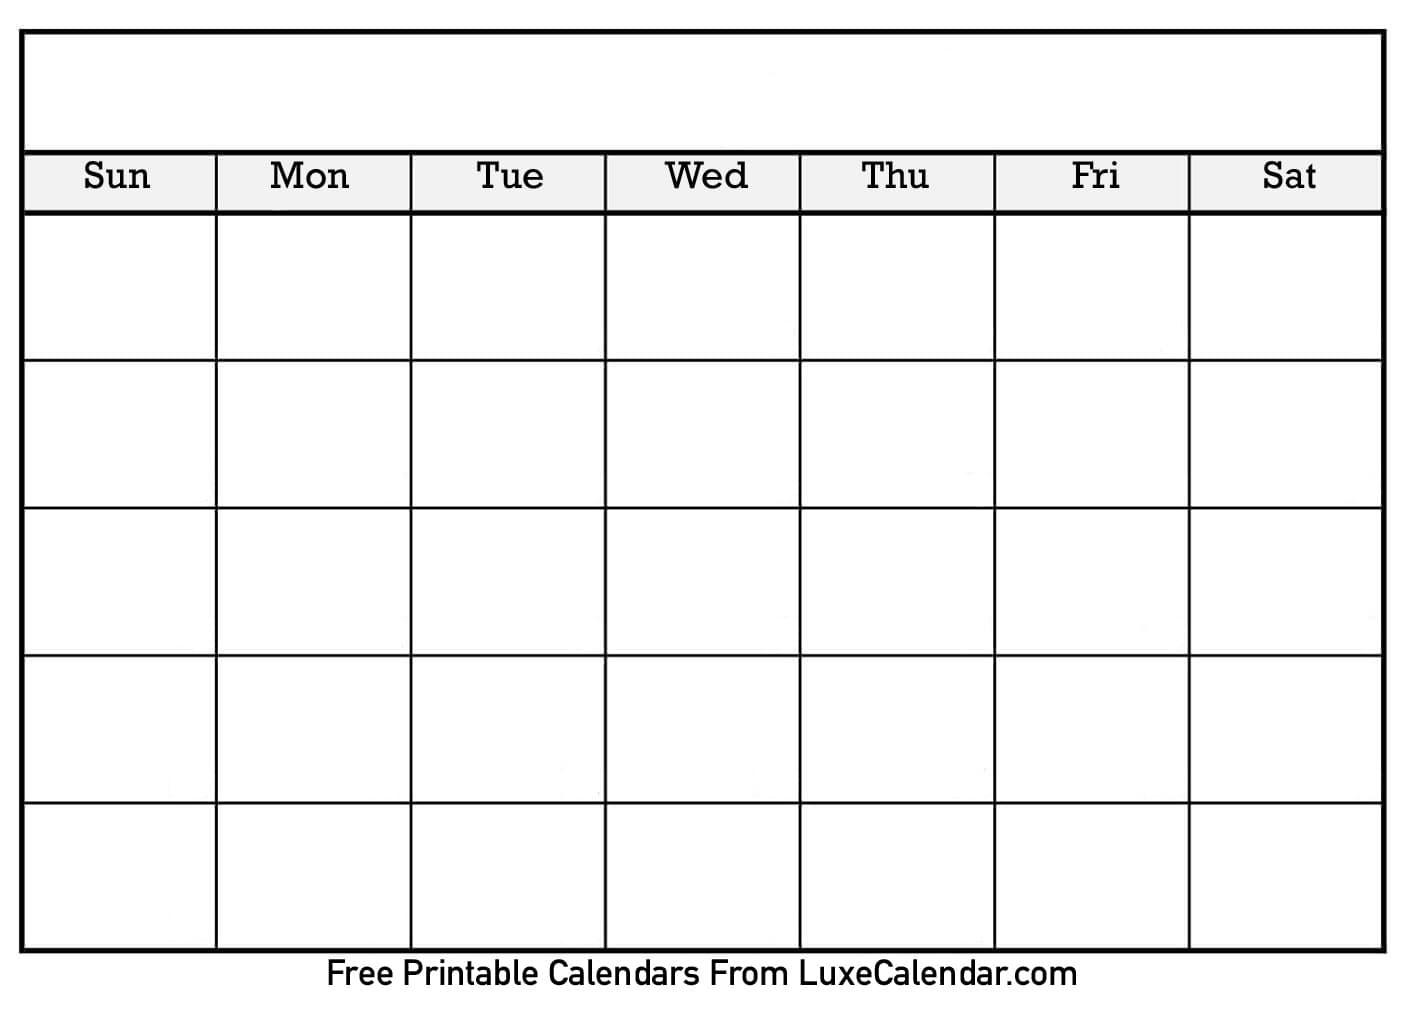 Blank Printable Calendar - Luxe Calendar_Calendar Blank Month Template